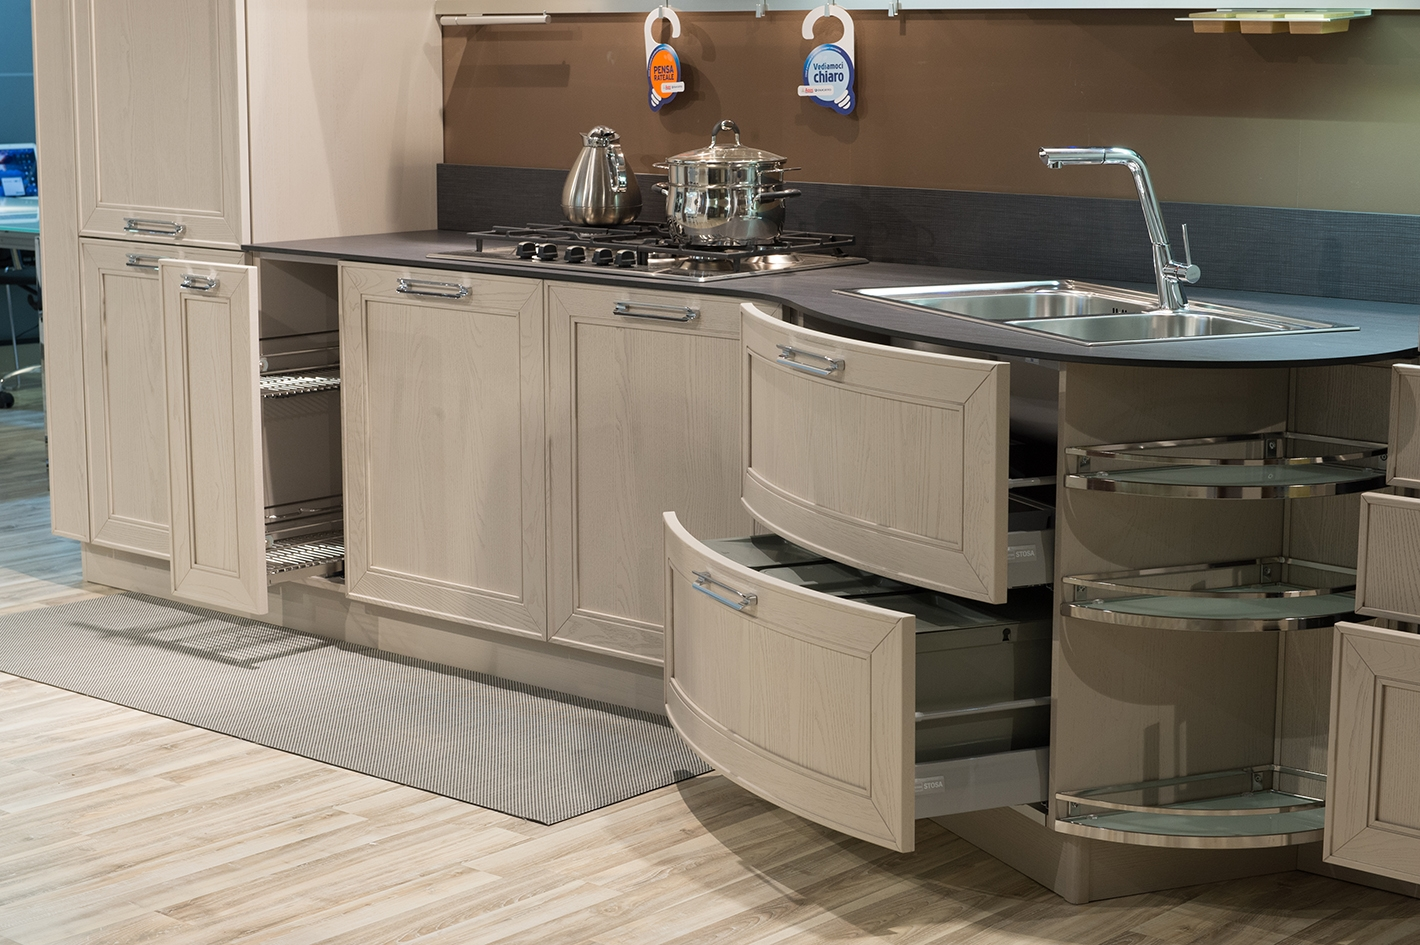 Cucina stosa mod maxim completa di elettrodomestici 20232 - Elettrodomestici cucina ...